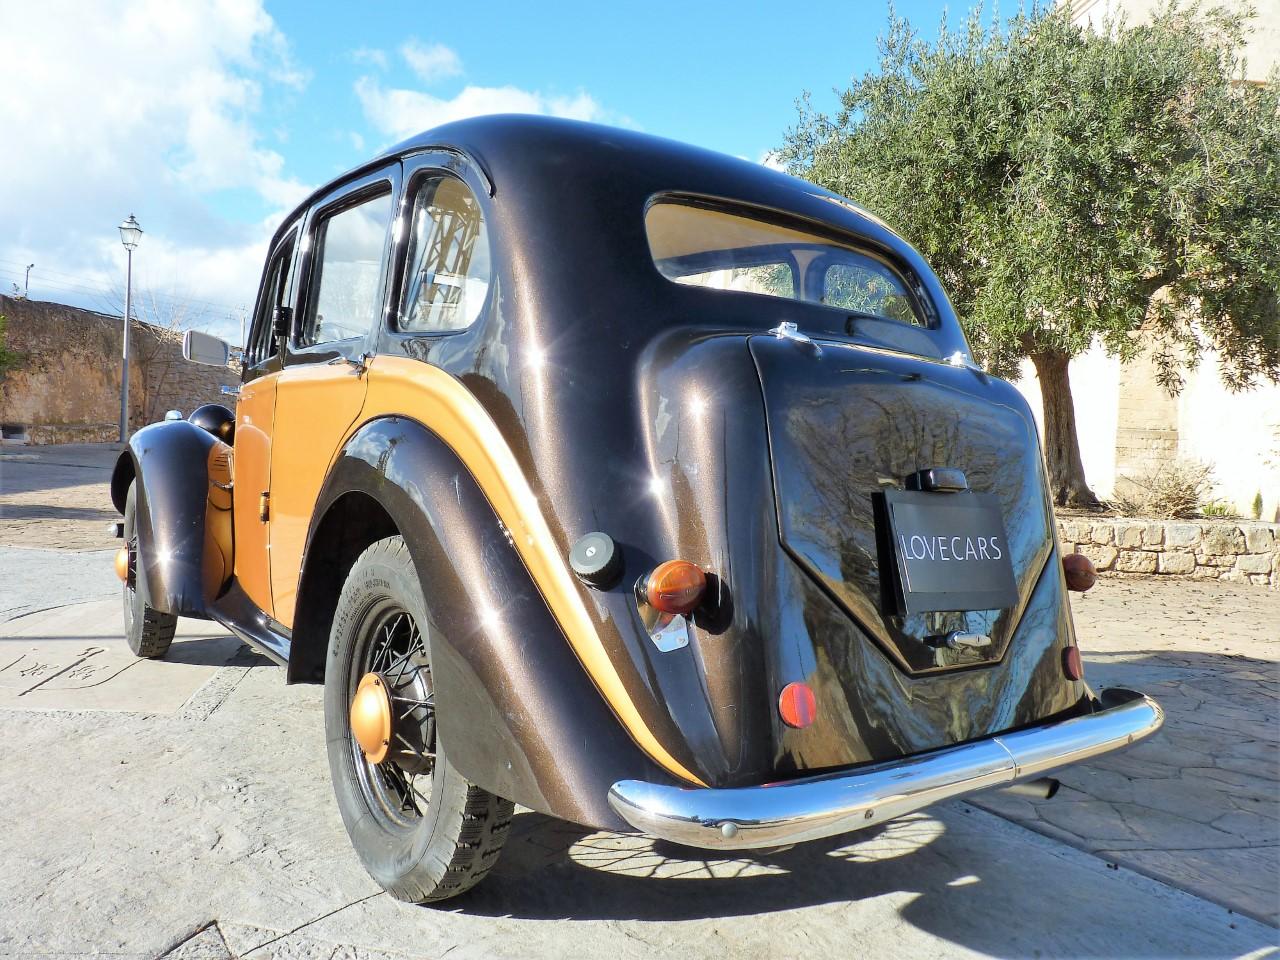 Oldtimer-Mallorca-Oldtimer-mieten-Mallorca-Hillman-Minx-1940-4